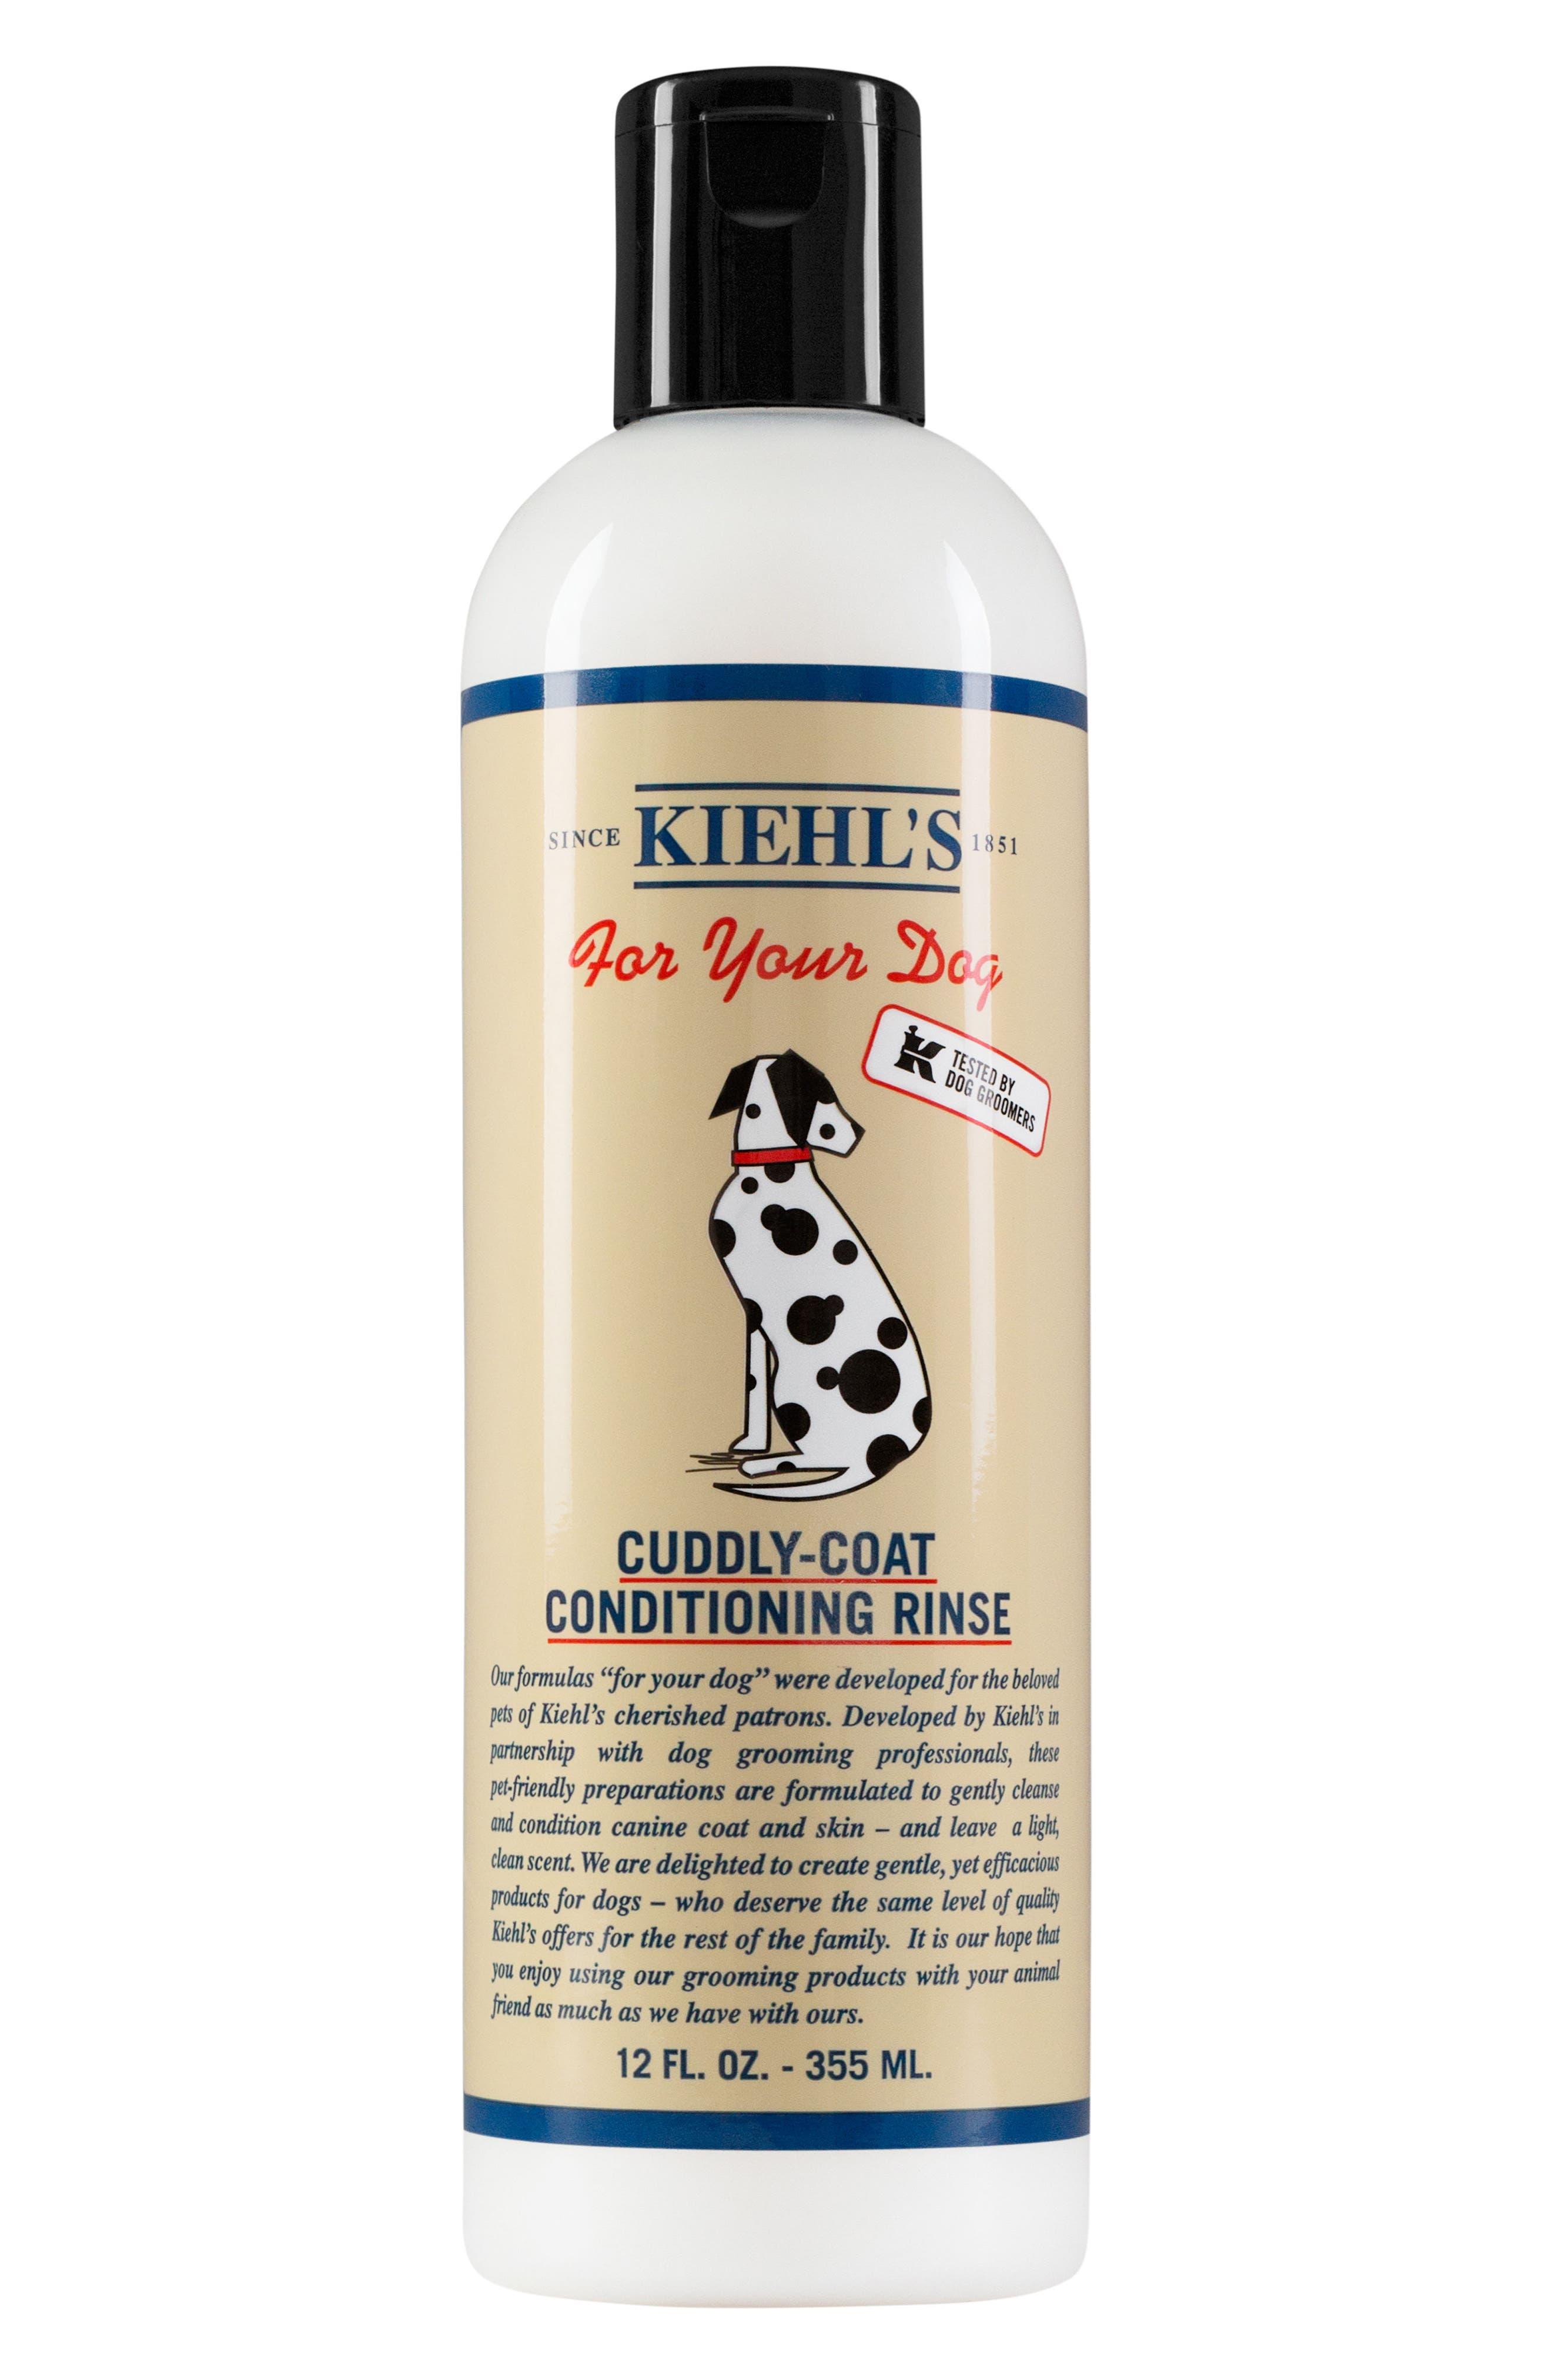 'Cuddly-Coat' Dog Conditioning Rinse,                             Main thumbnail 1, color,                             No Color